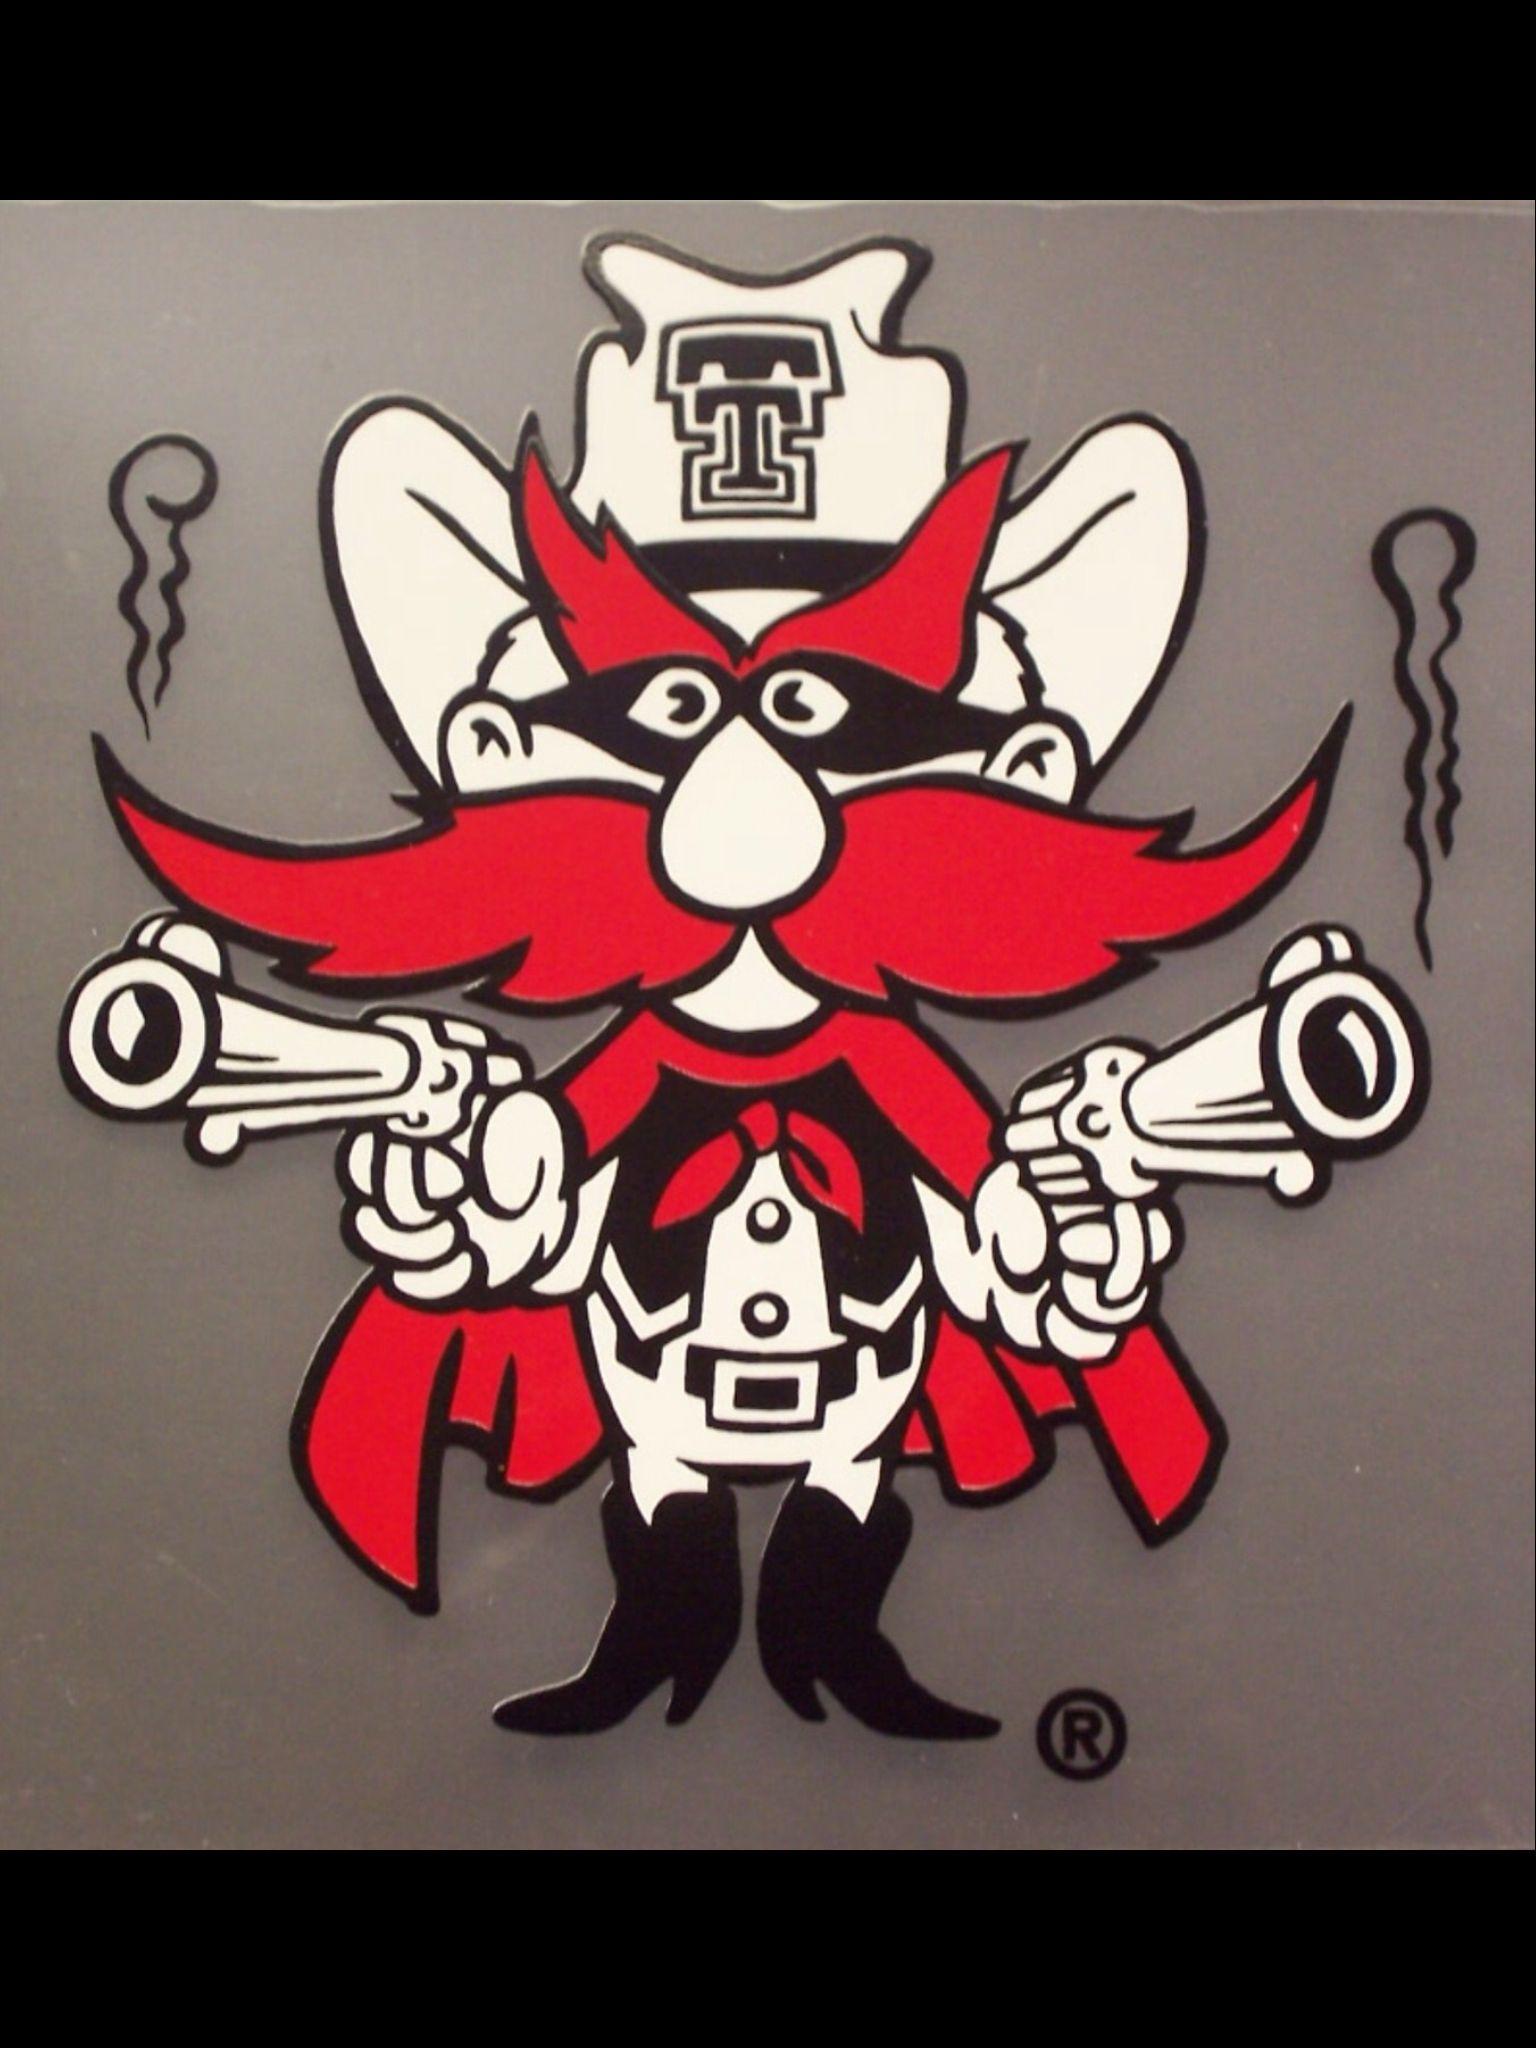 Old School Raider Red Texas tech mascot, Texas tech red